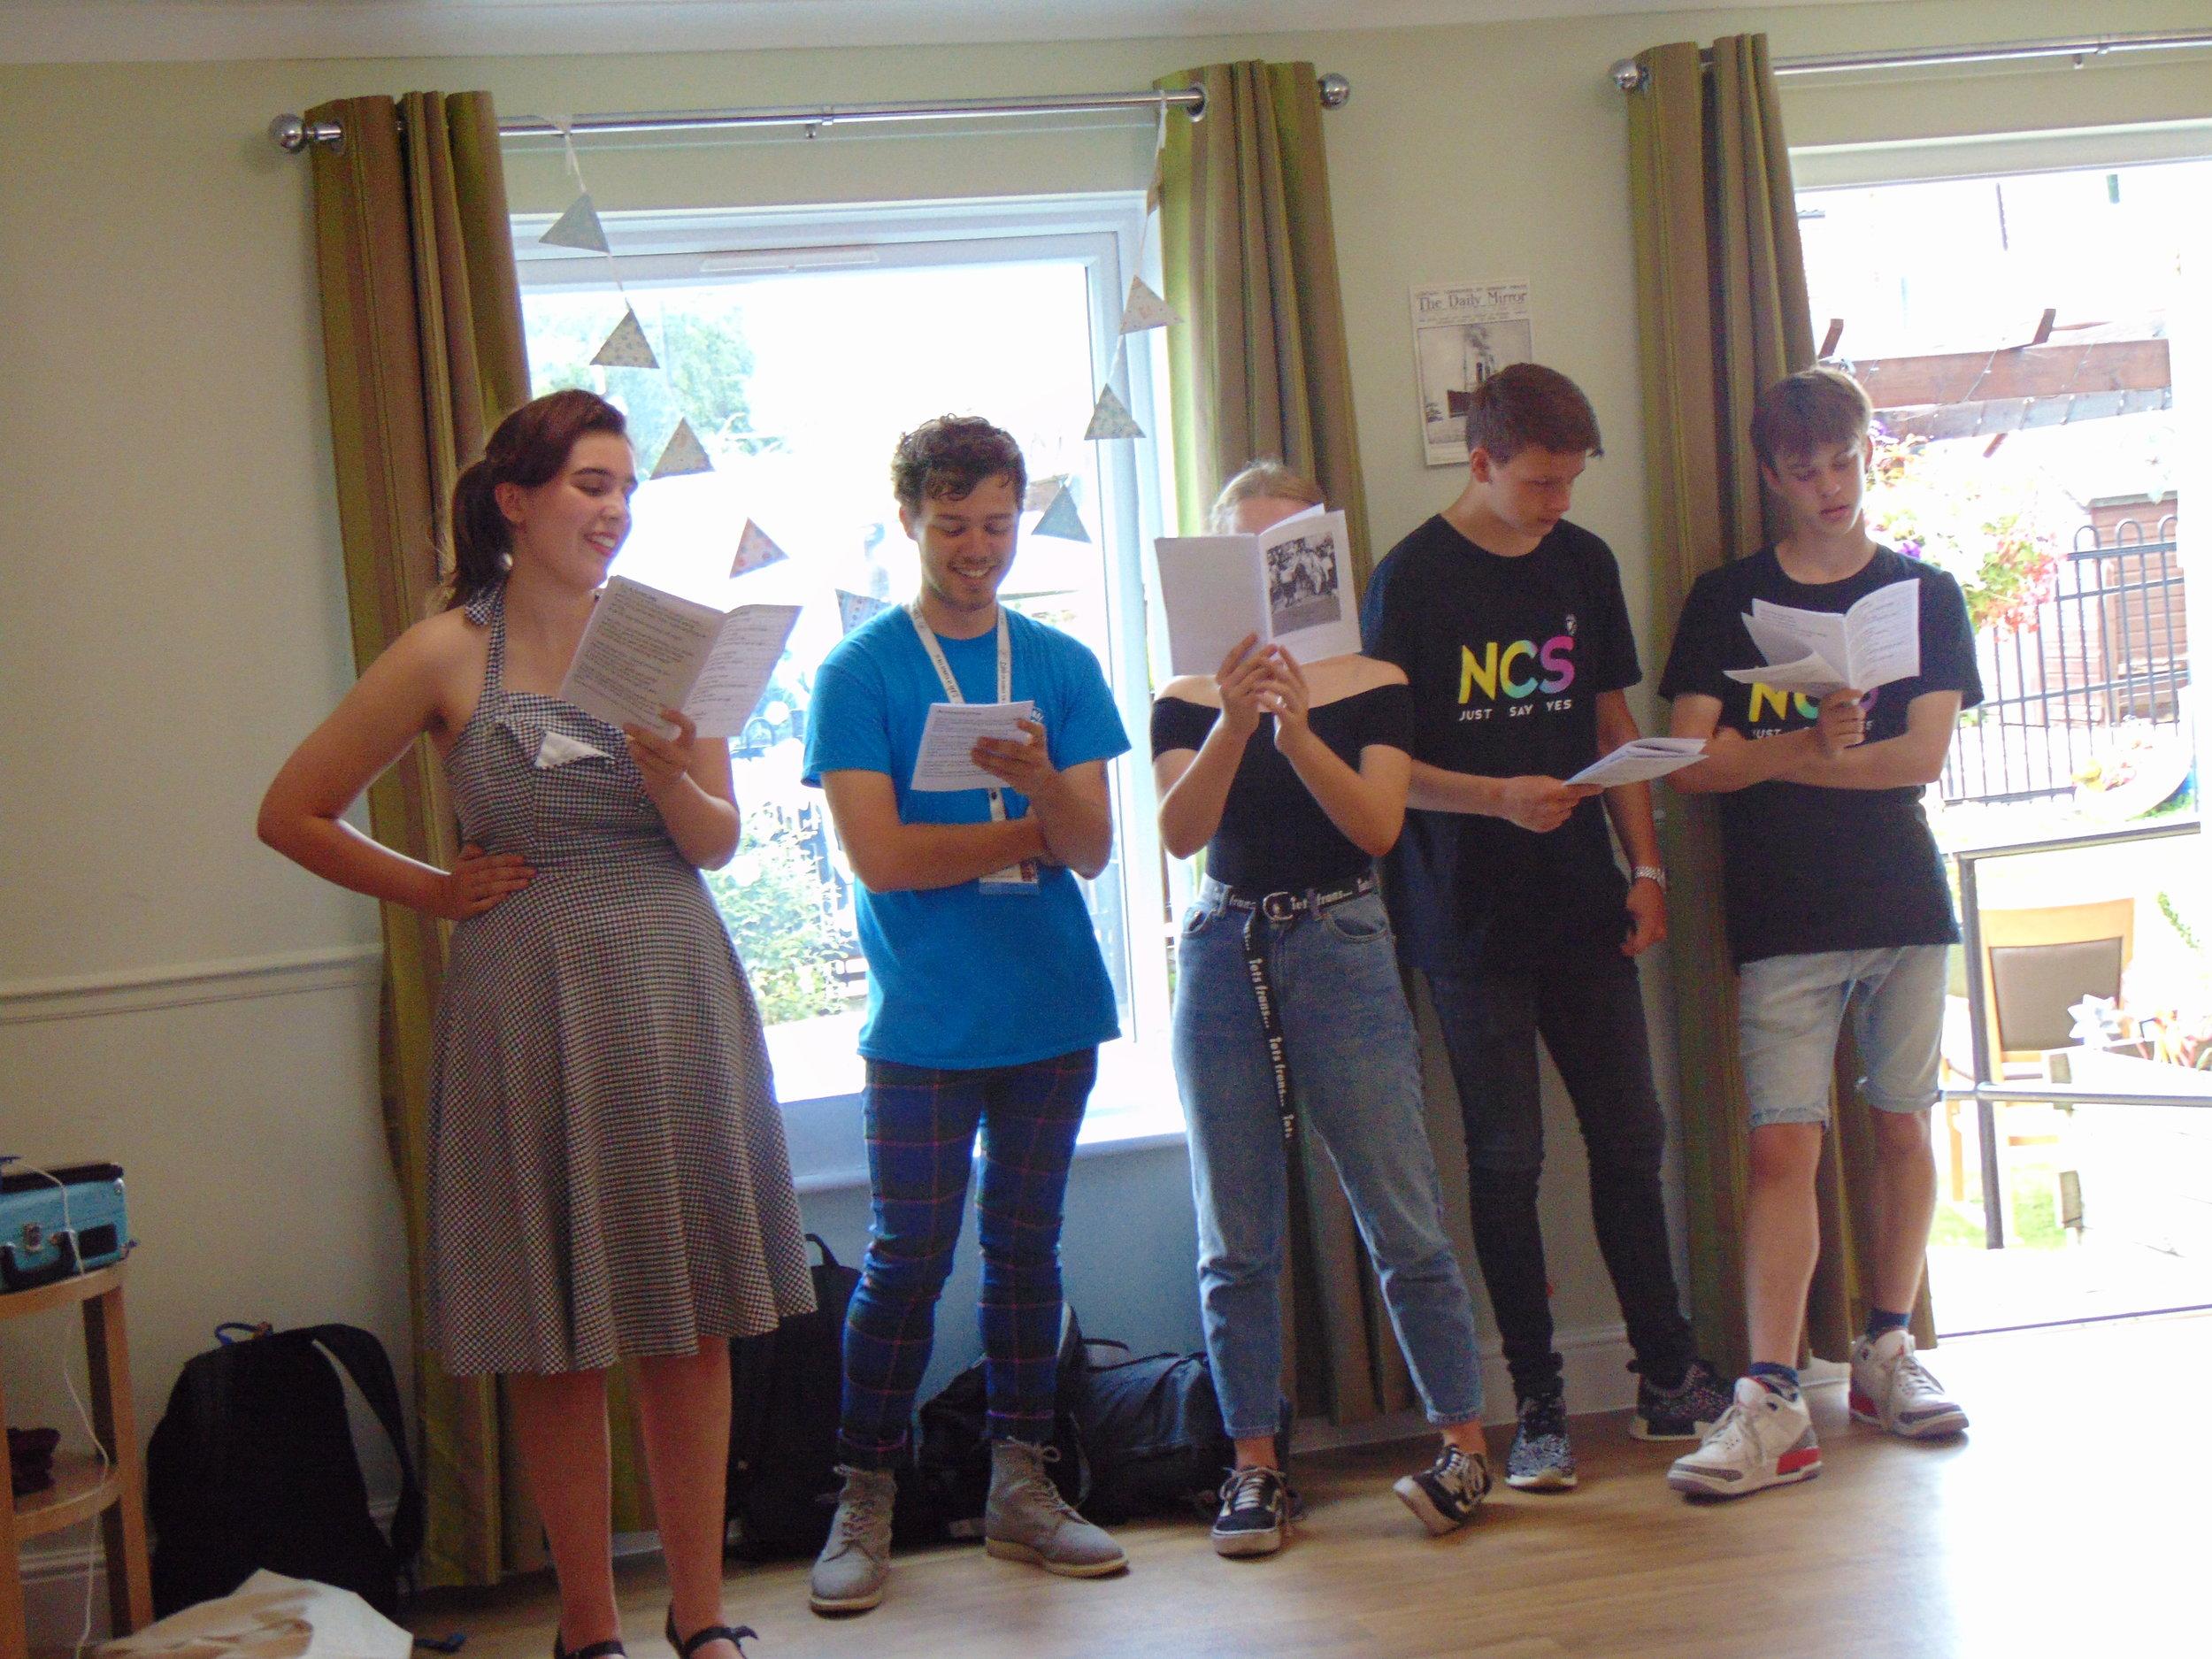 Group 2 singing performance